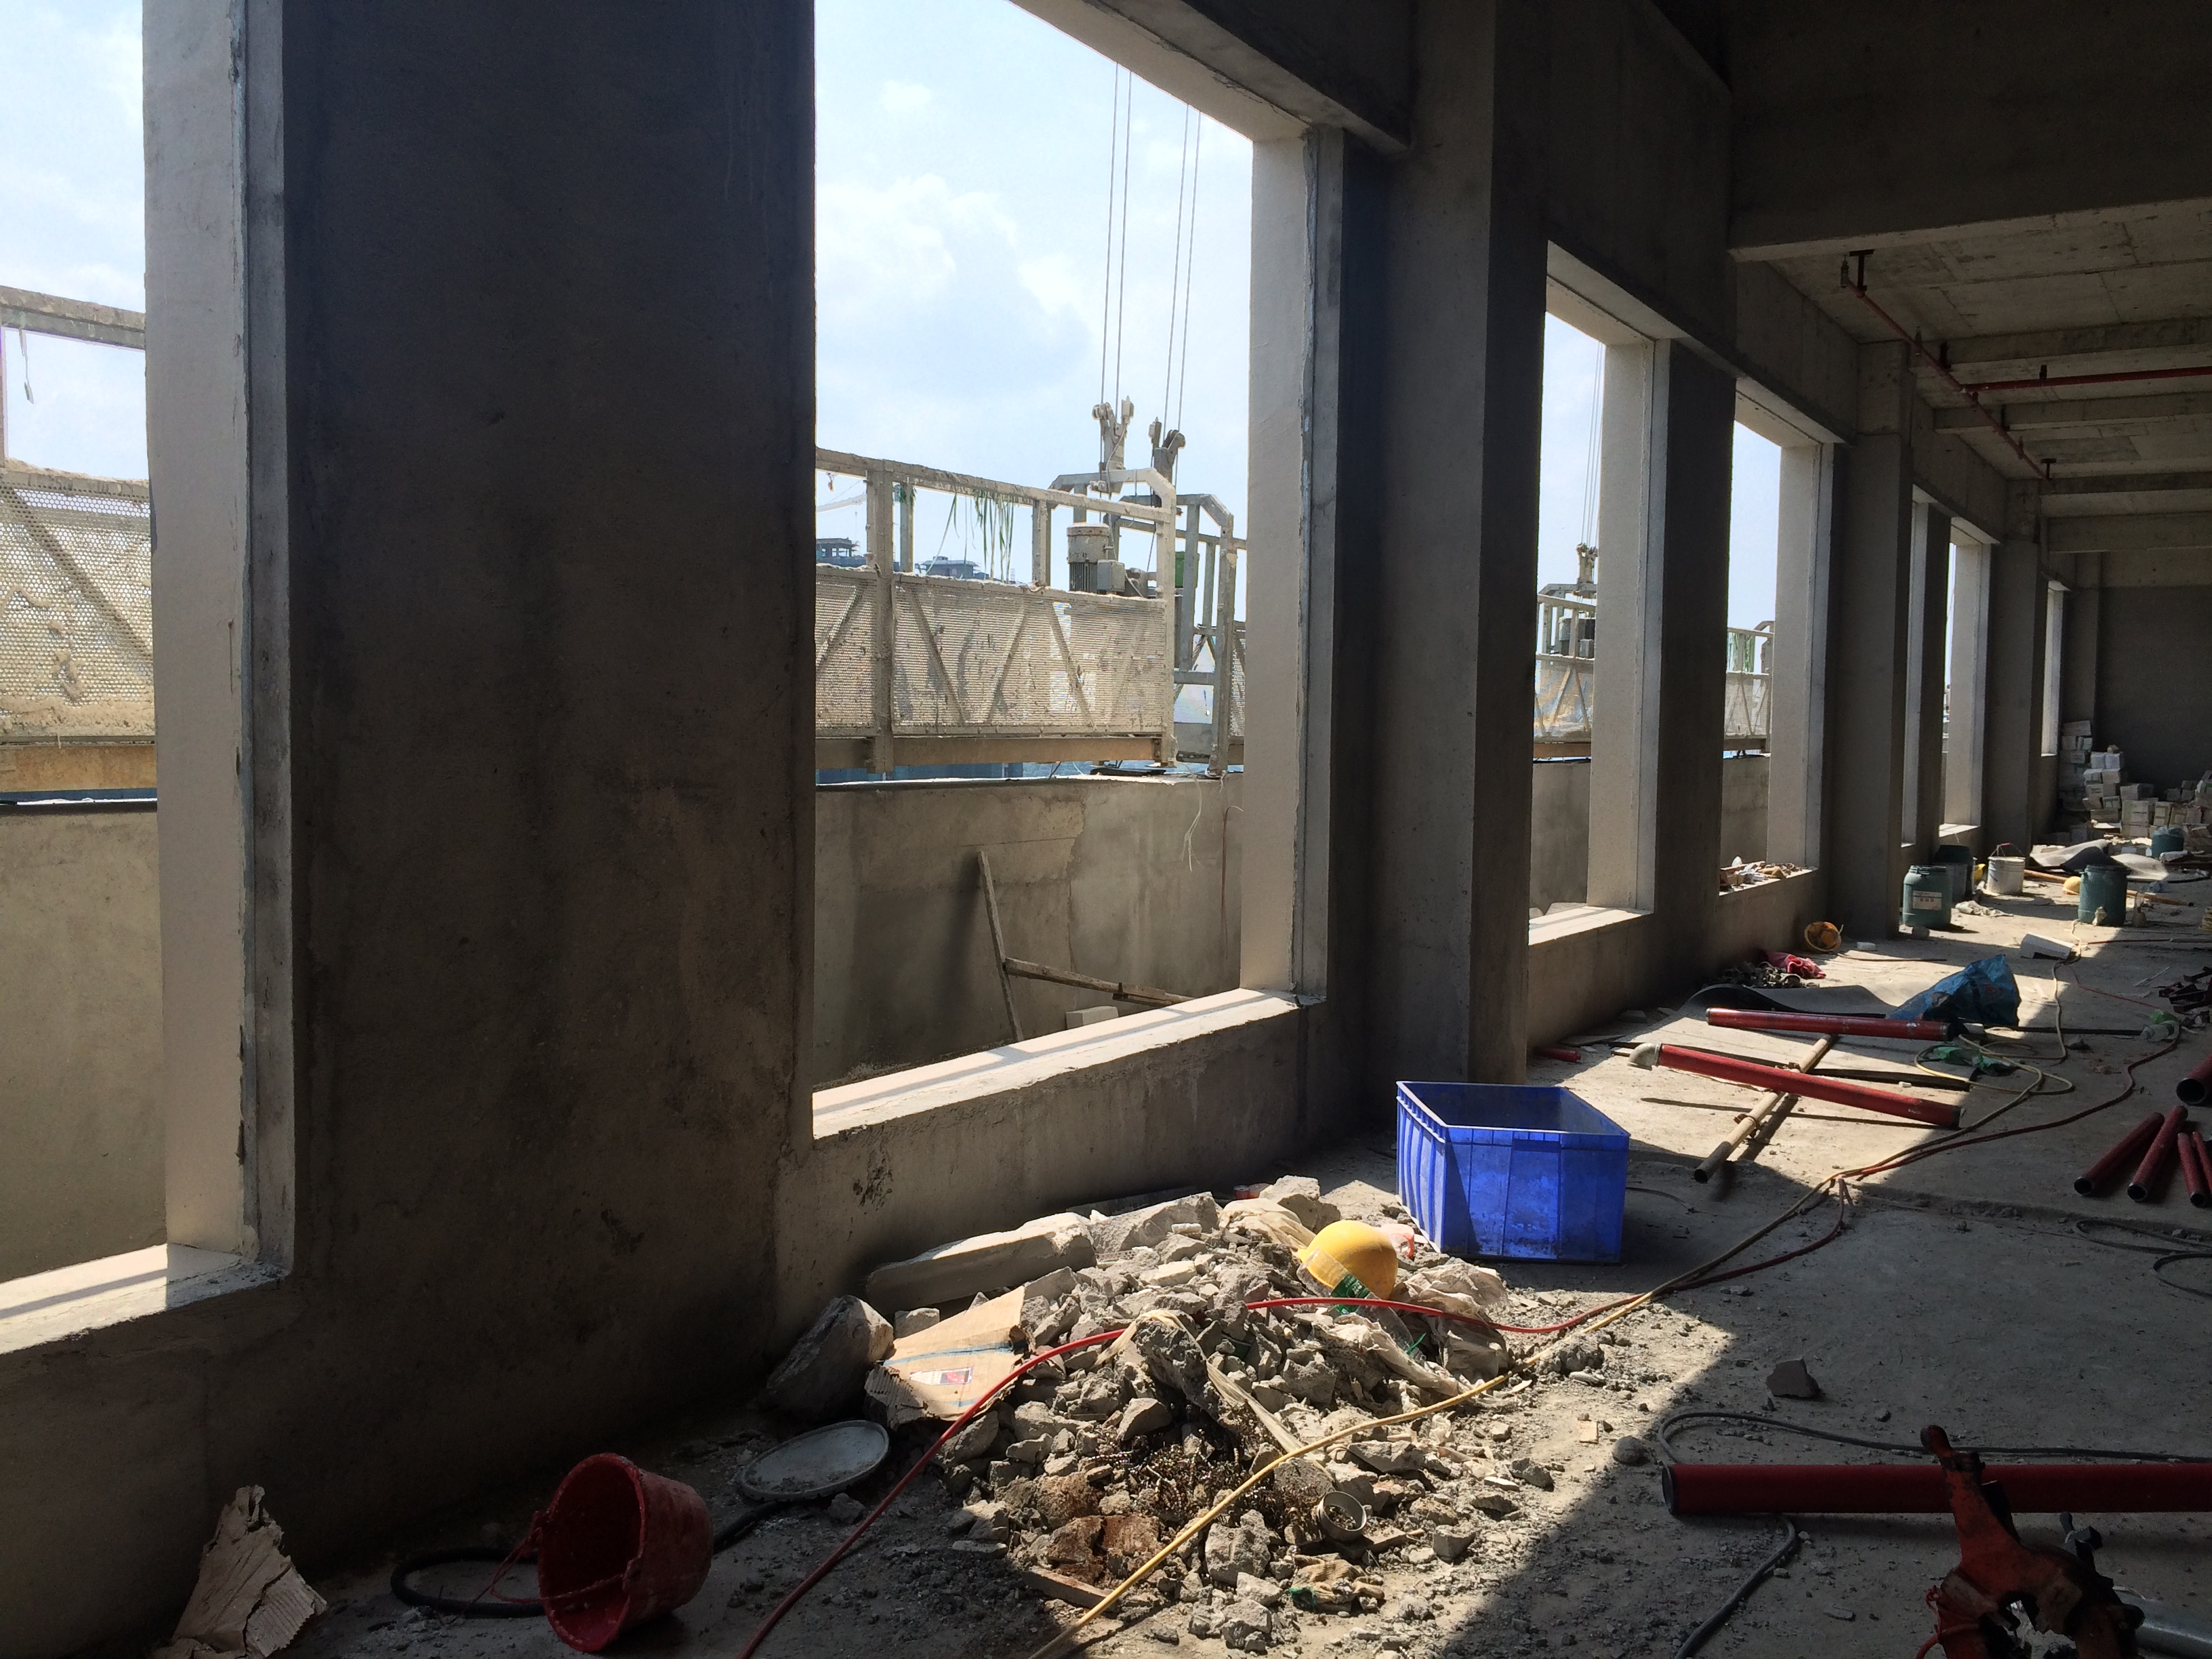 Lounge under construction